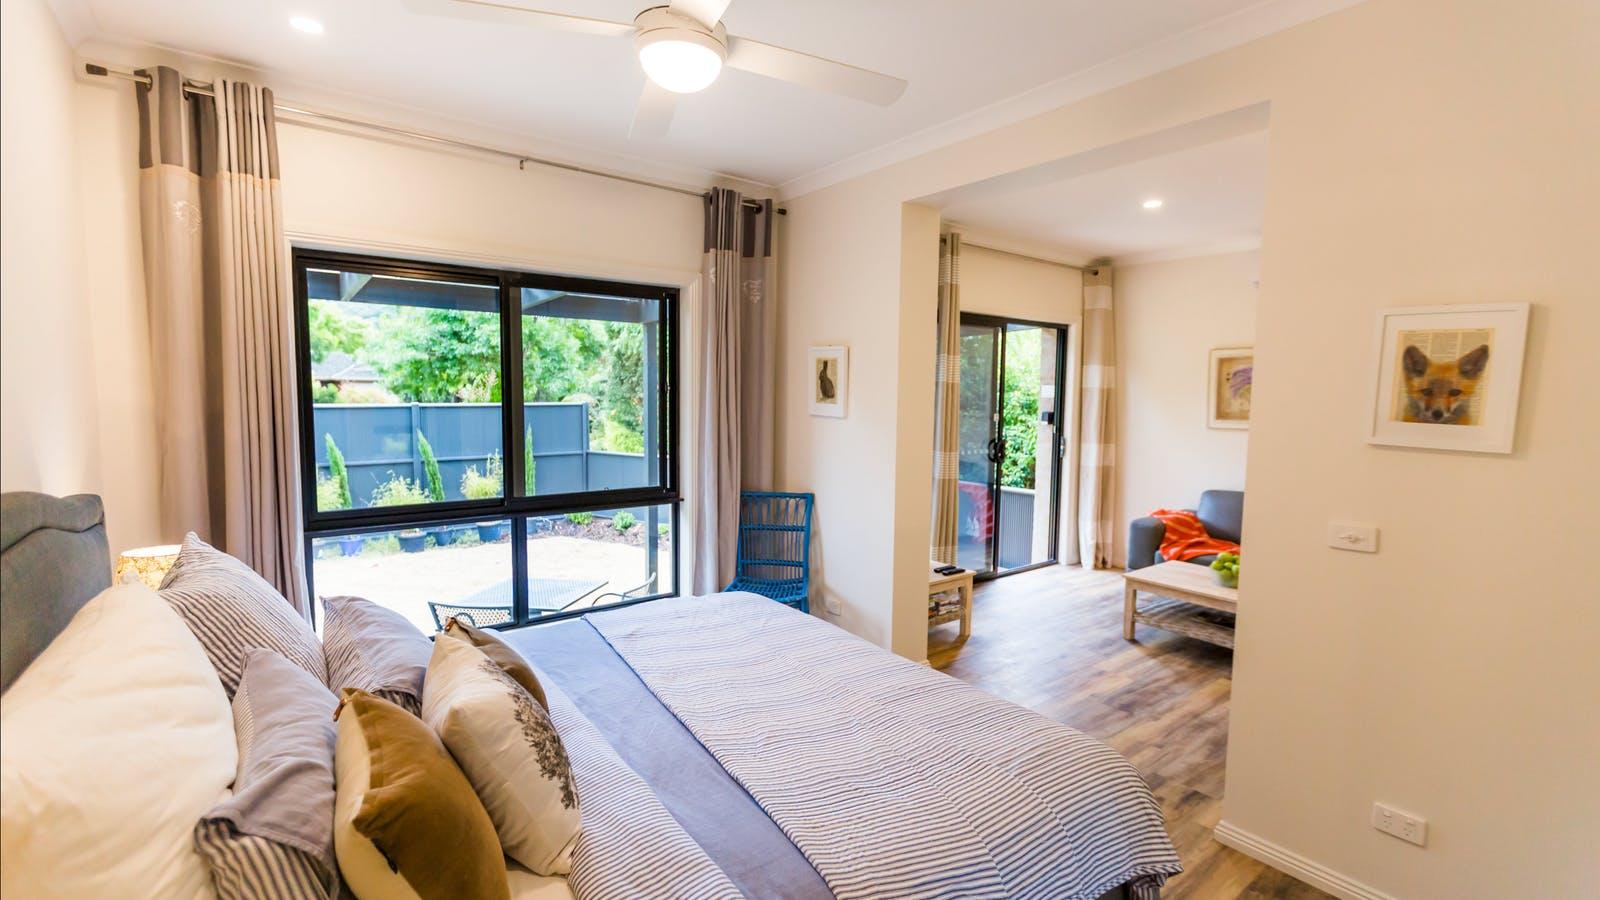 Double glazed windows & spacious rooms